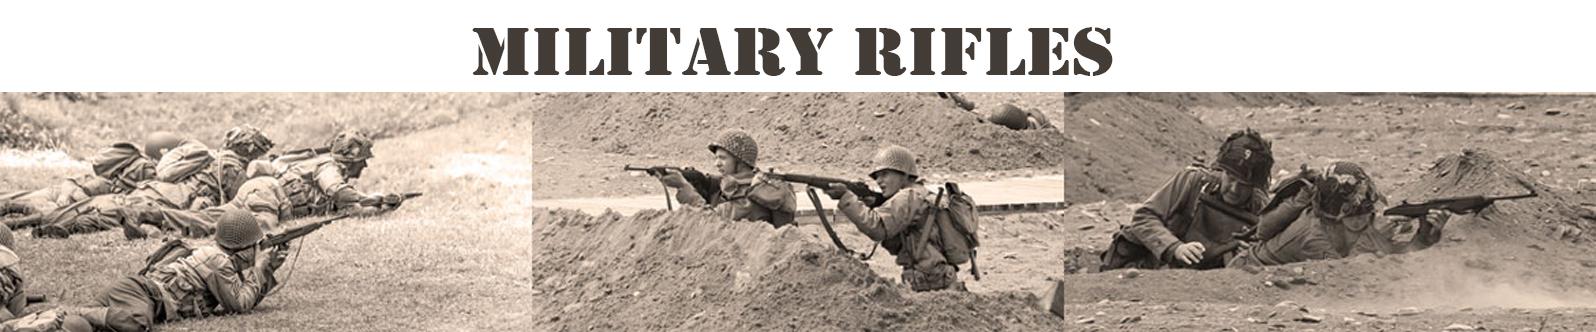 MilitaryRifles